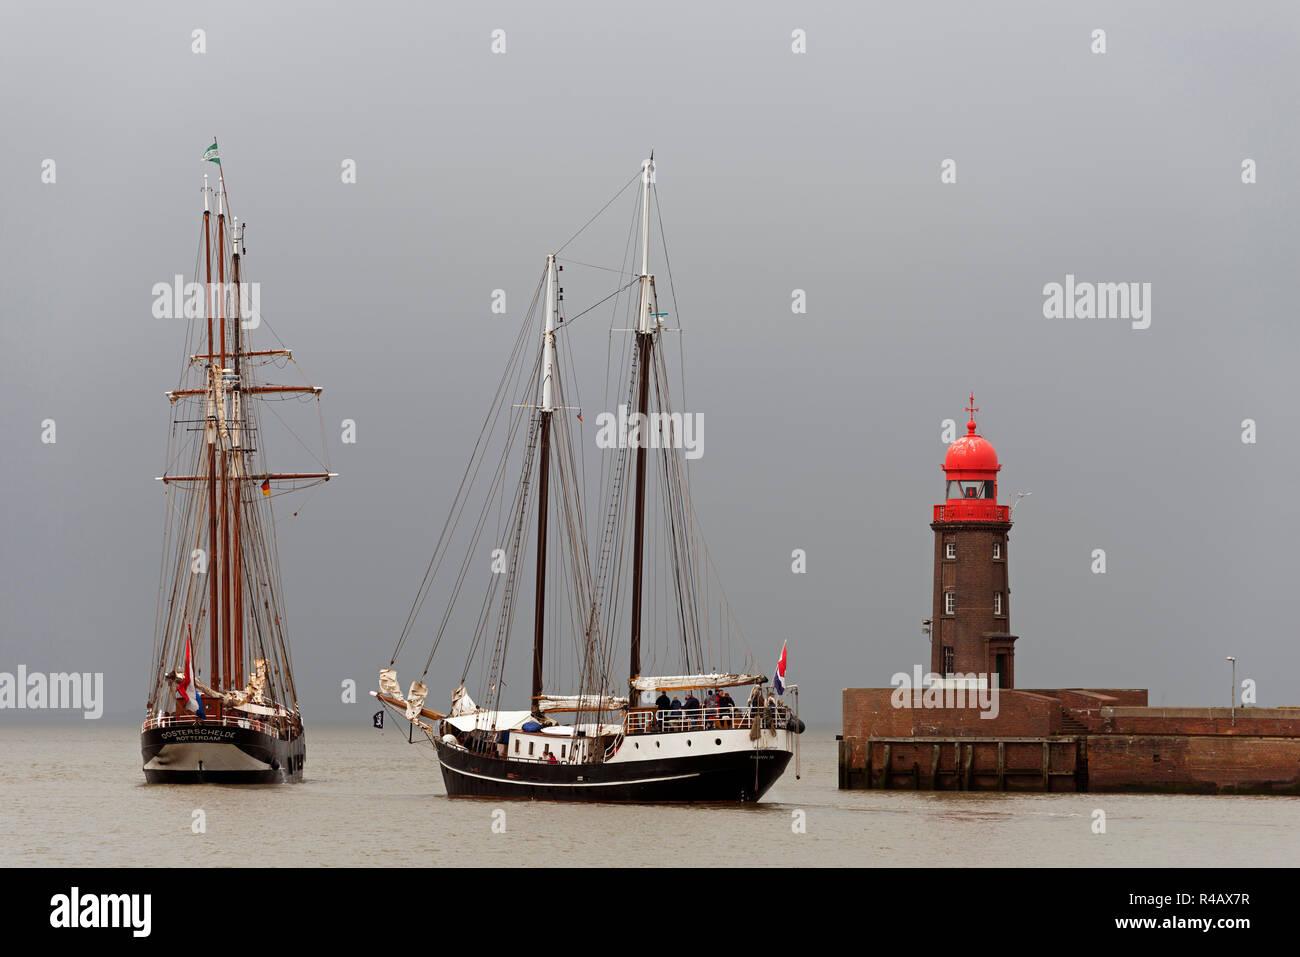 Oosterschelde and Abel Tasman, Sailing ships, Bremerhaven, Lower Saxony, Germany - Stock Image